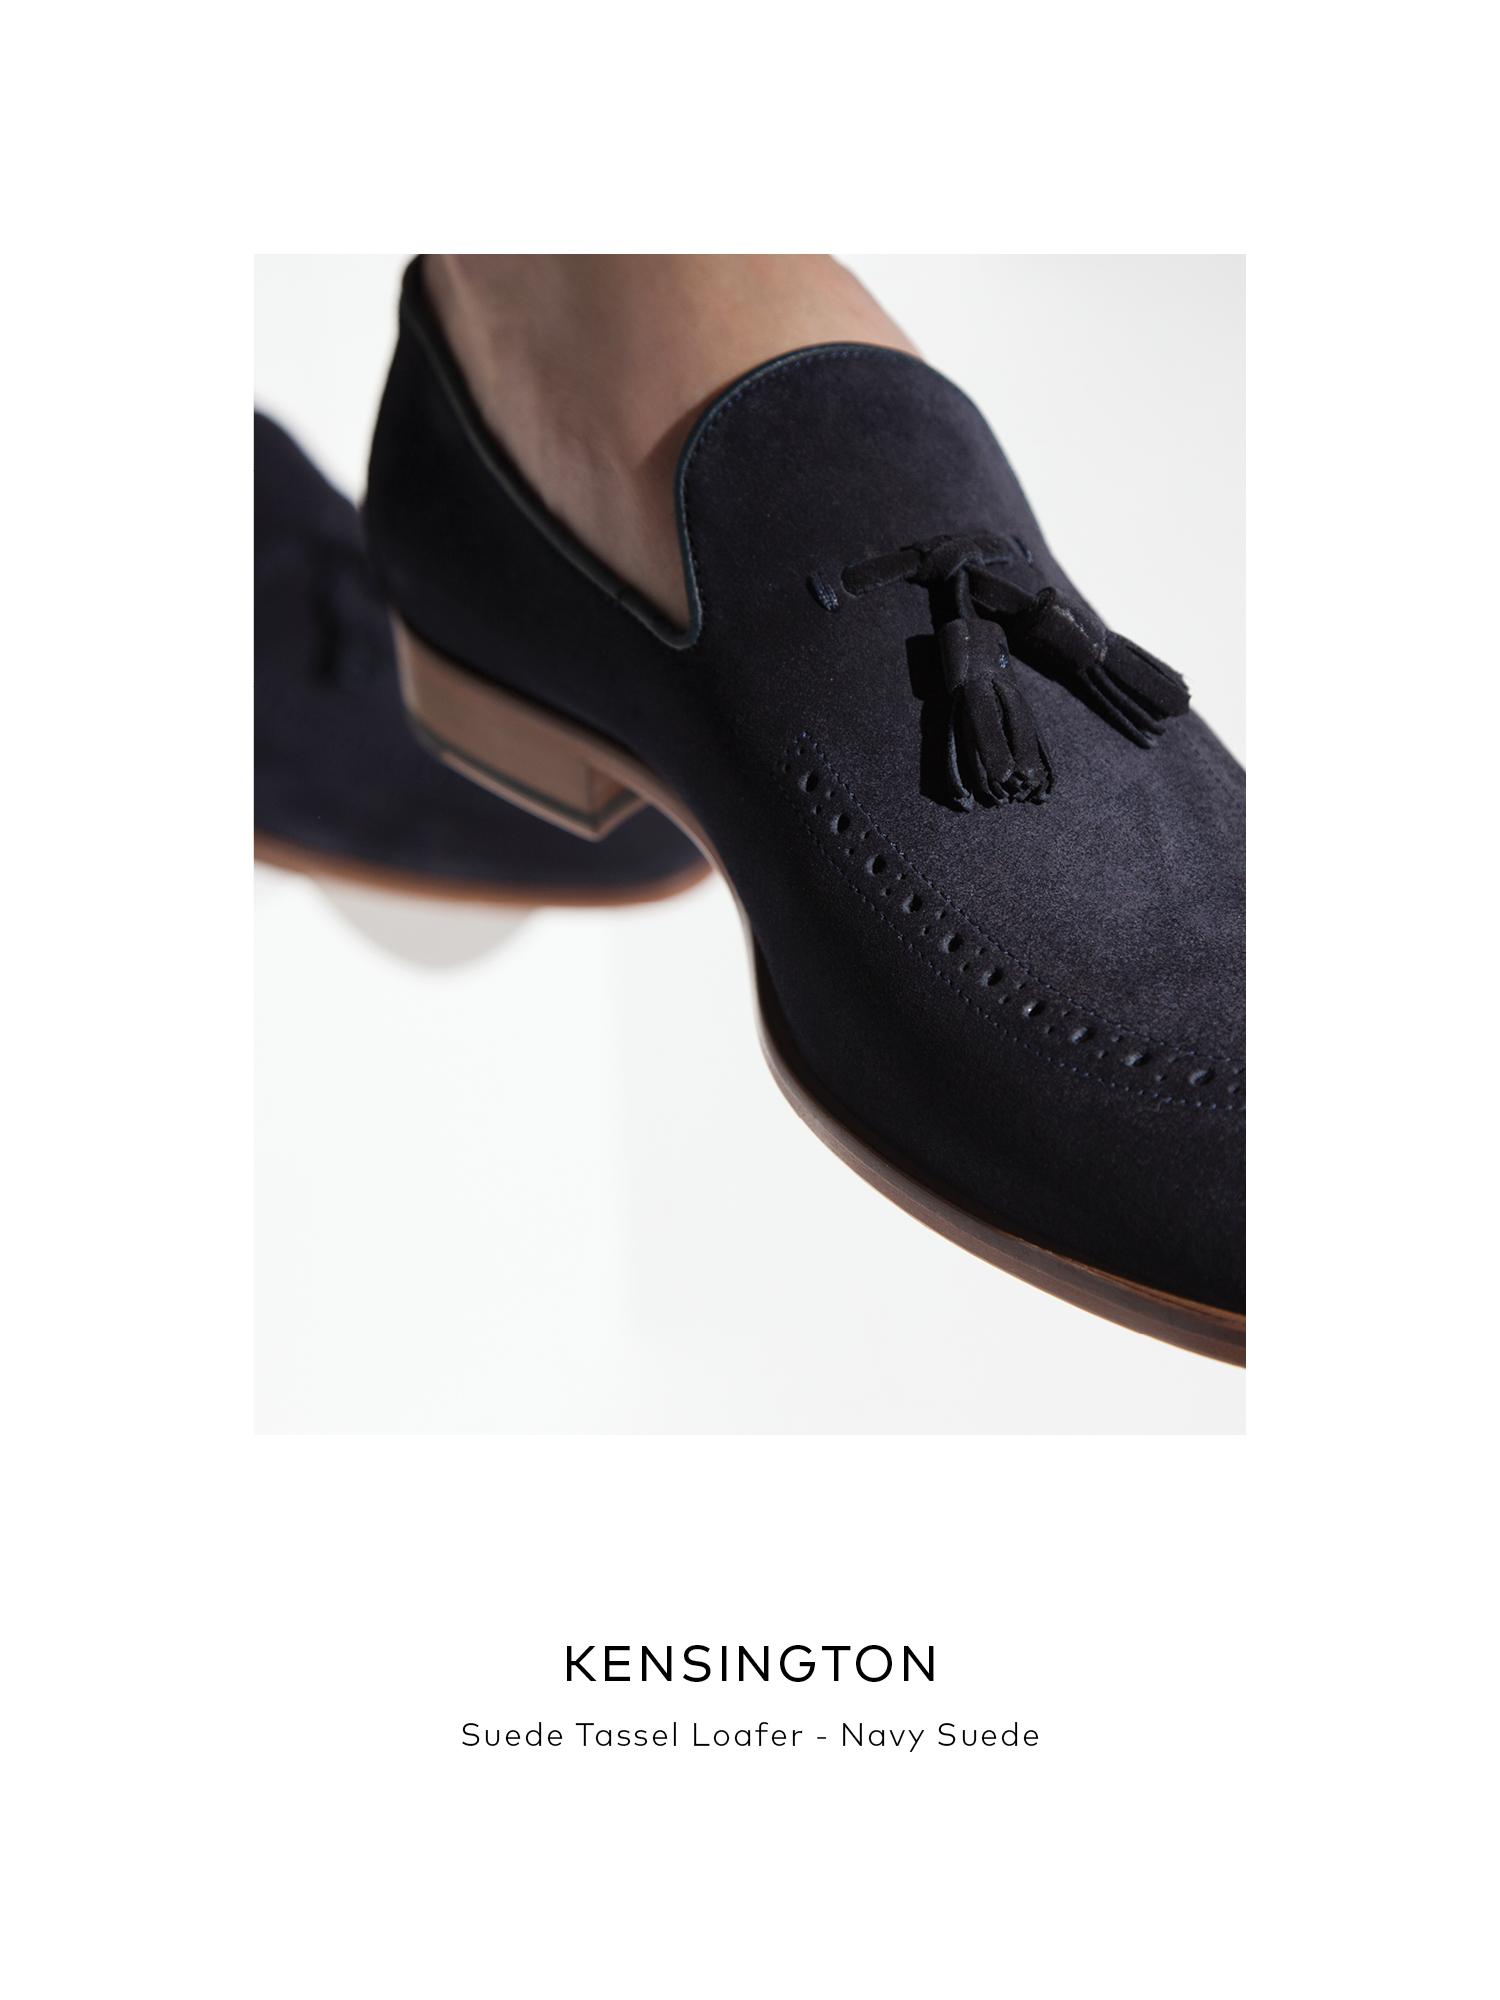 Kensington, Suede Tassel Loafer - Navy Suede